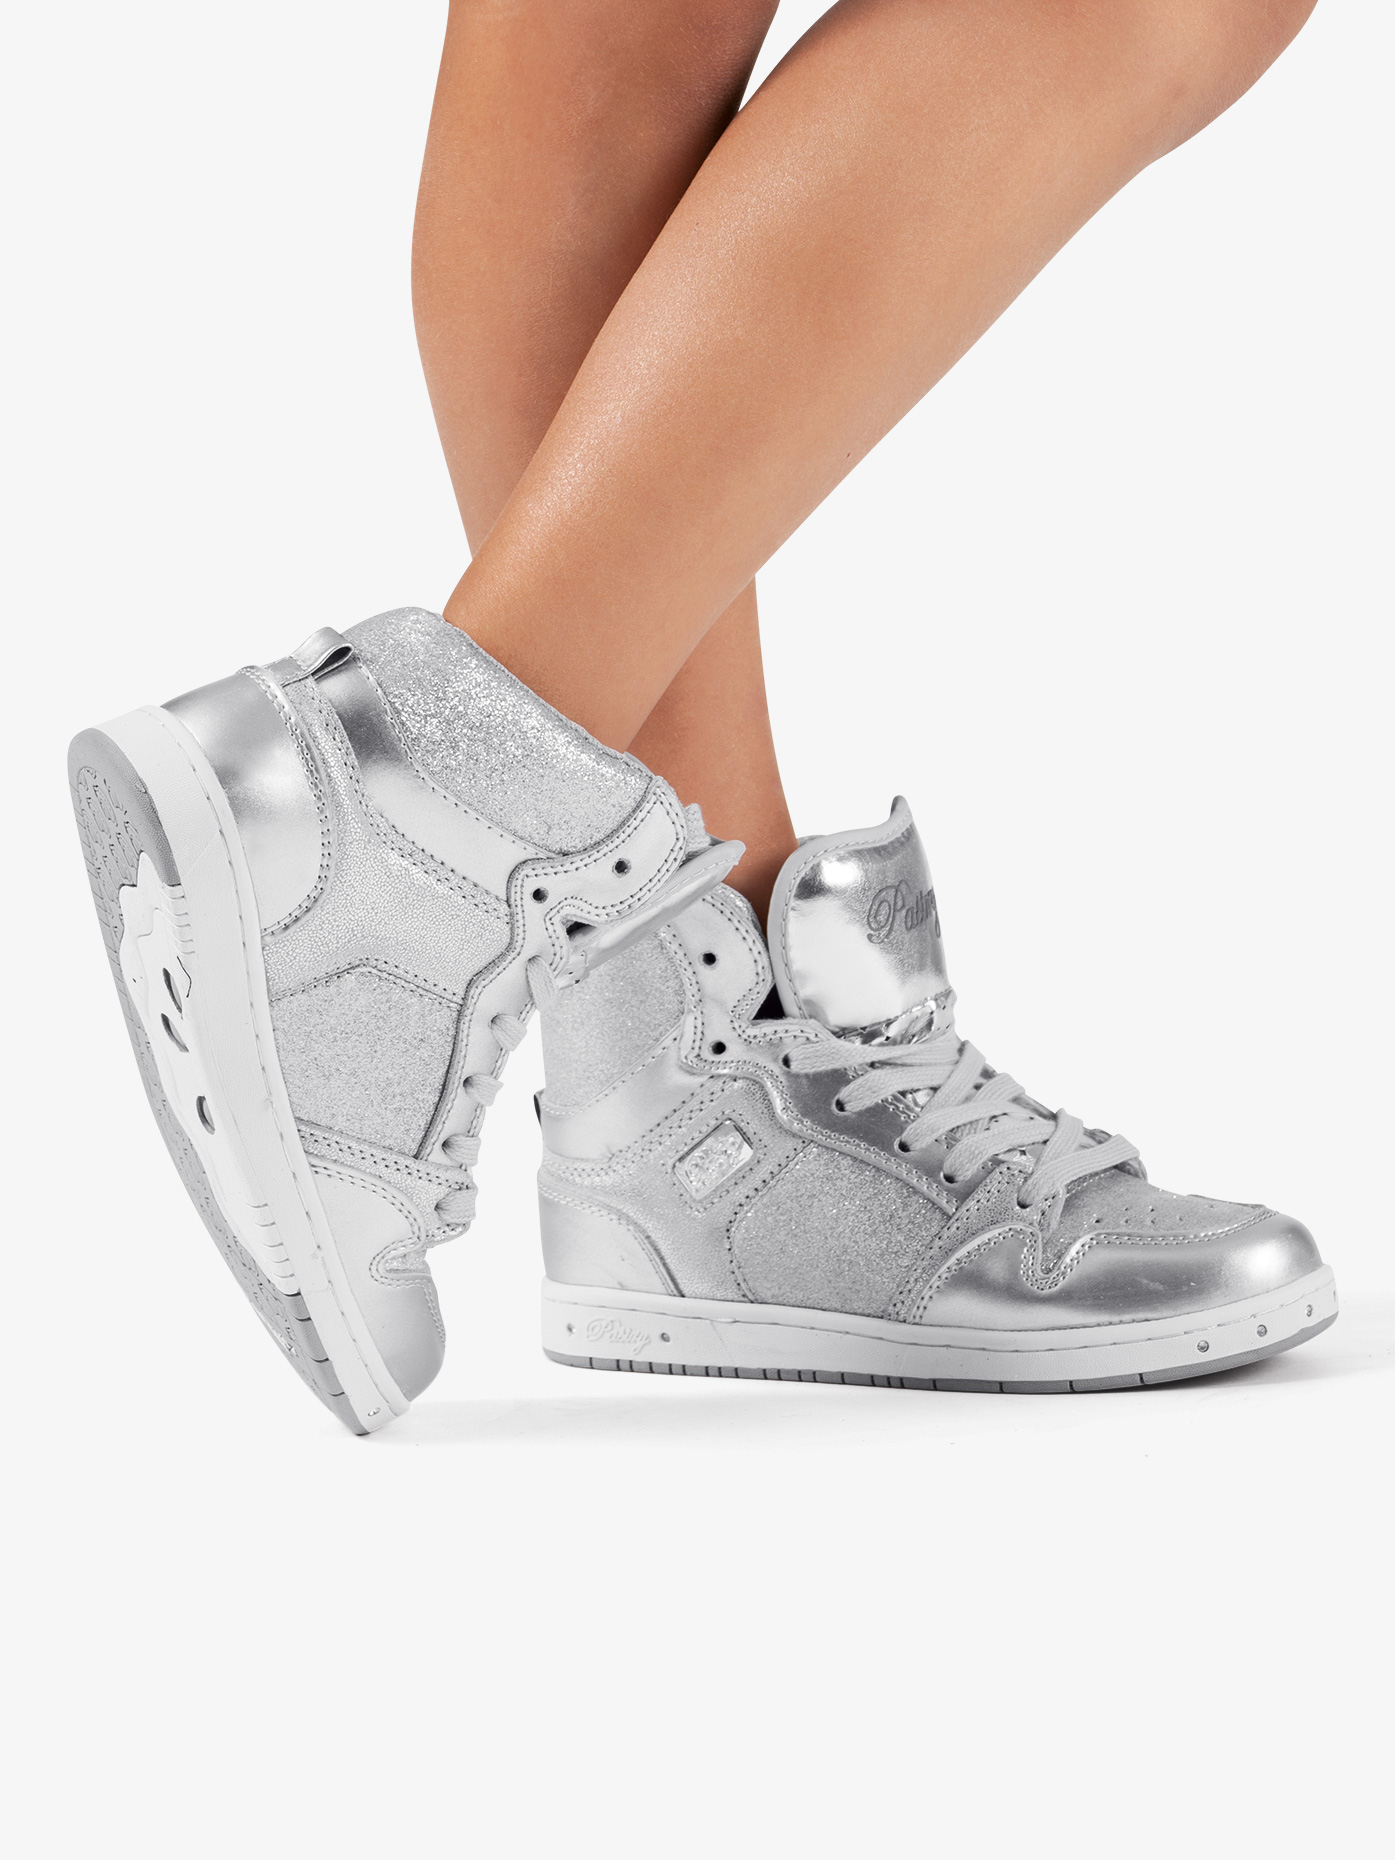 Pastry Kids Glam Pie Glitter Silver Sneakers PK143302